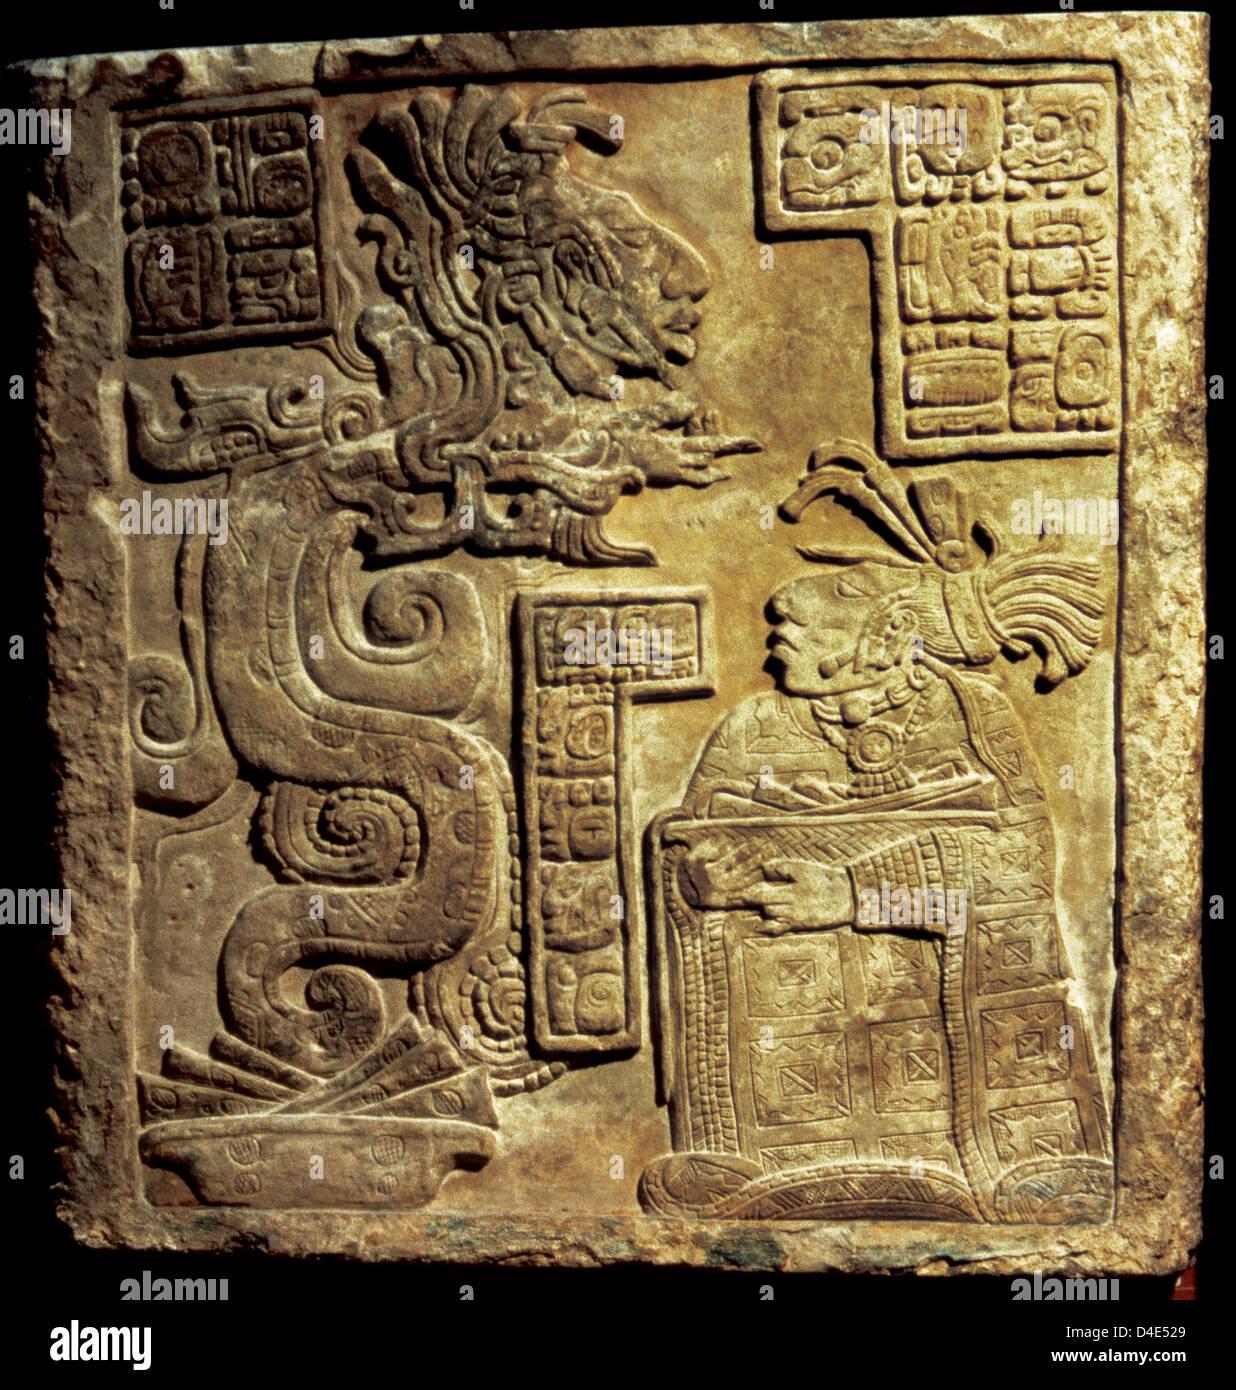 Pre-Columbian art. Central America. Maya. Lintel 15 from Yaxchilan, Late Classic Maya. 8th century. British Museum, - Stock Image